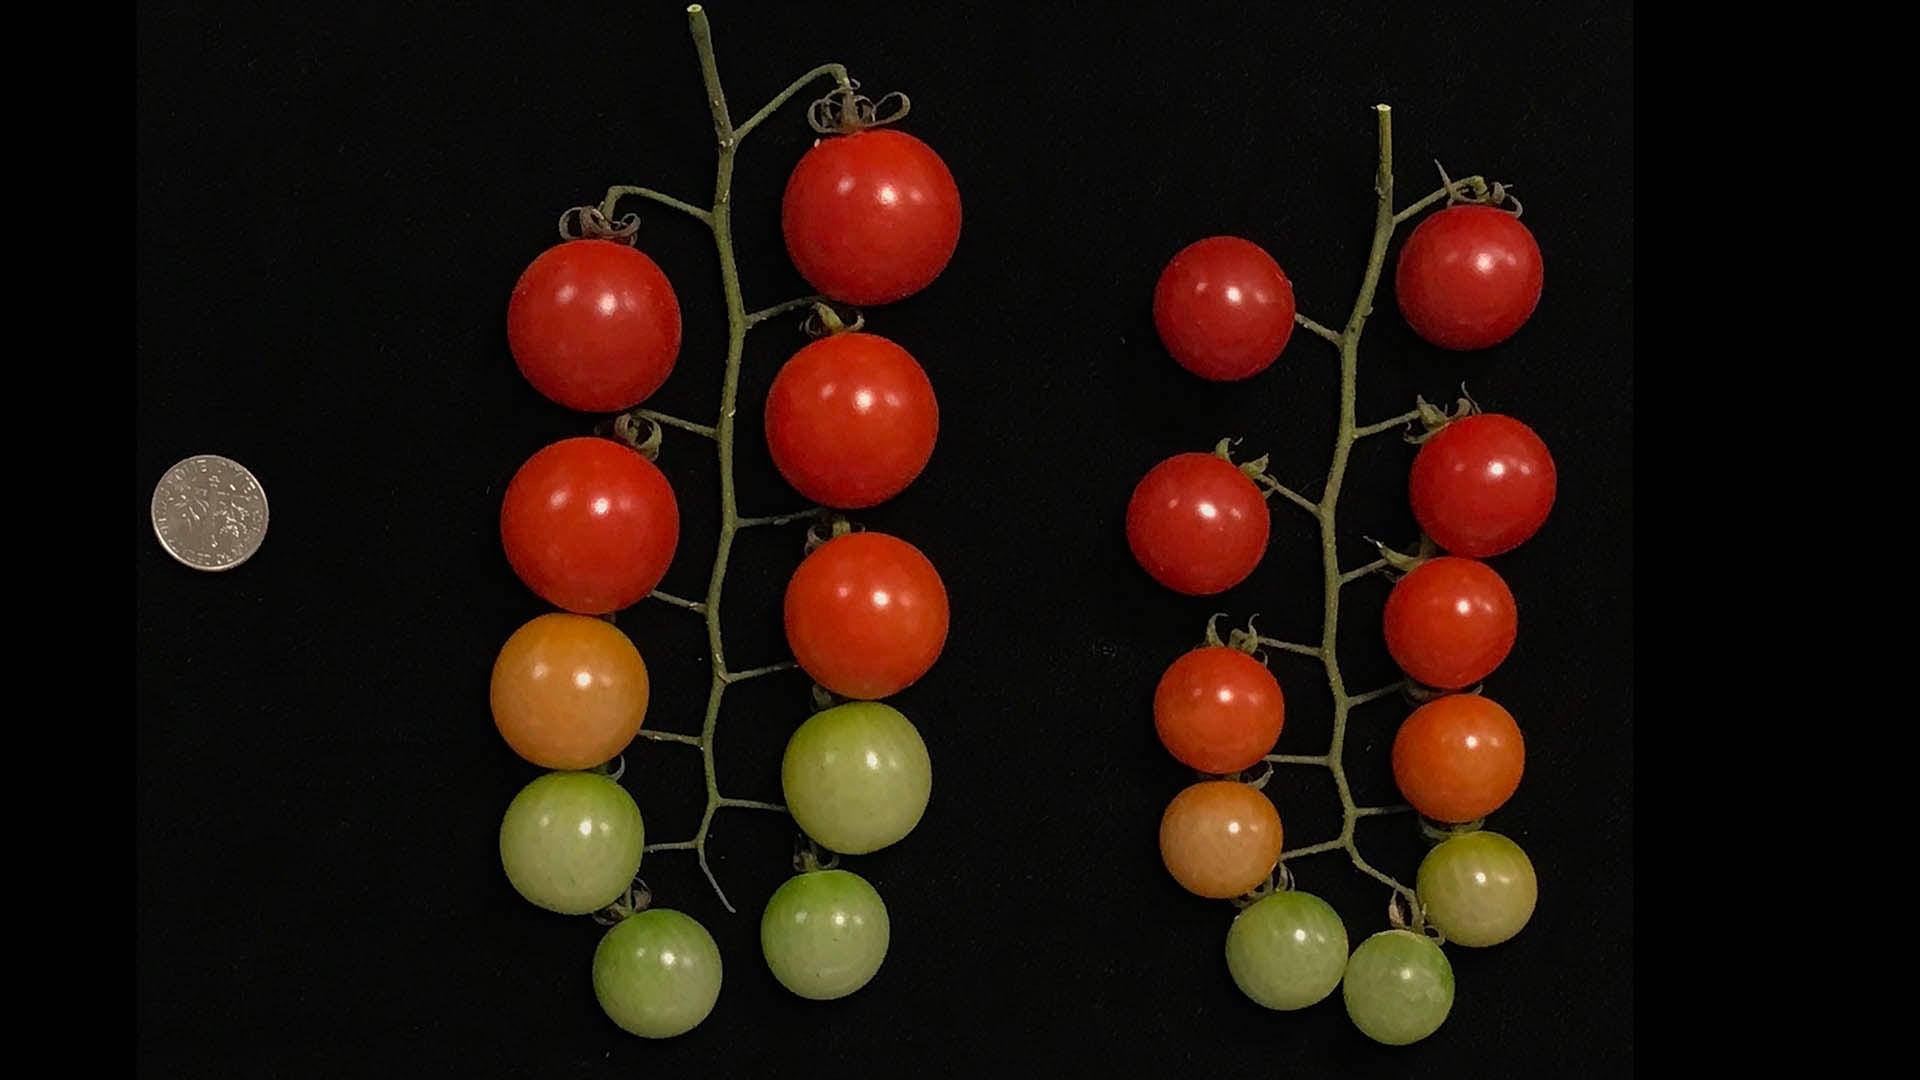 photo of tomato size with coin comparison